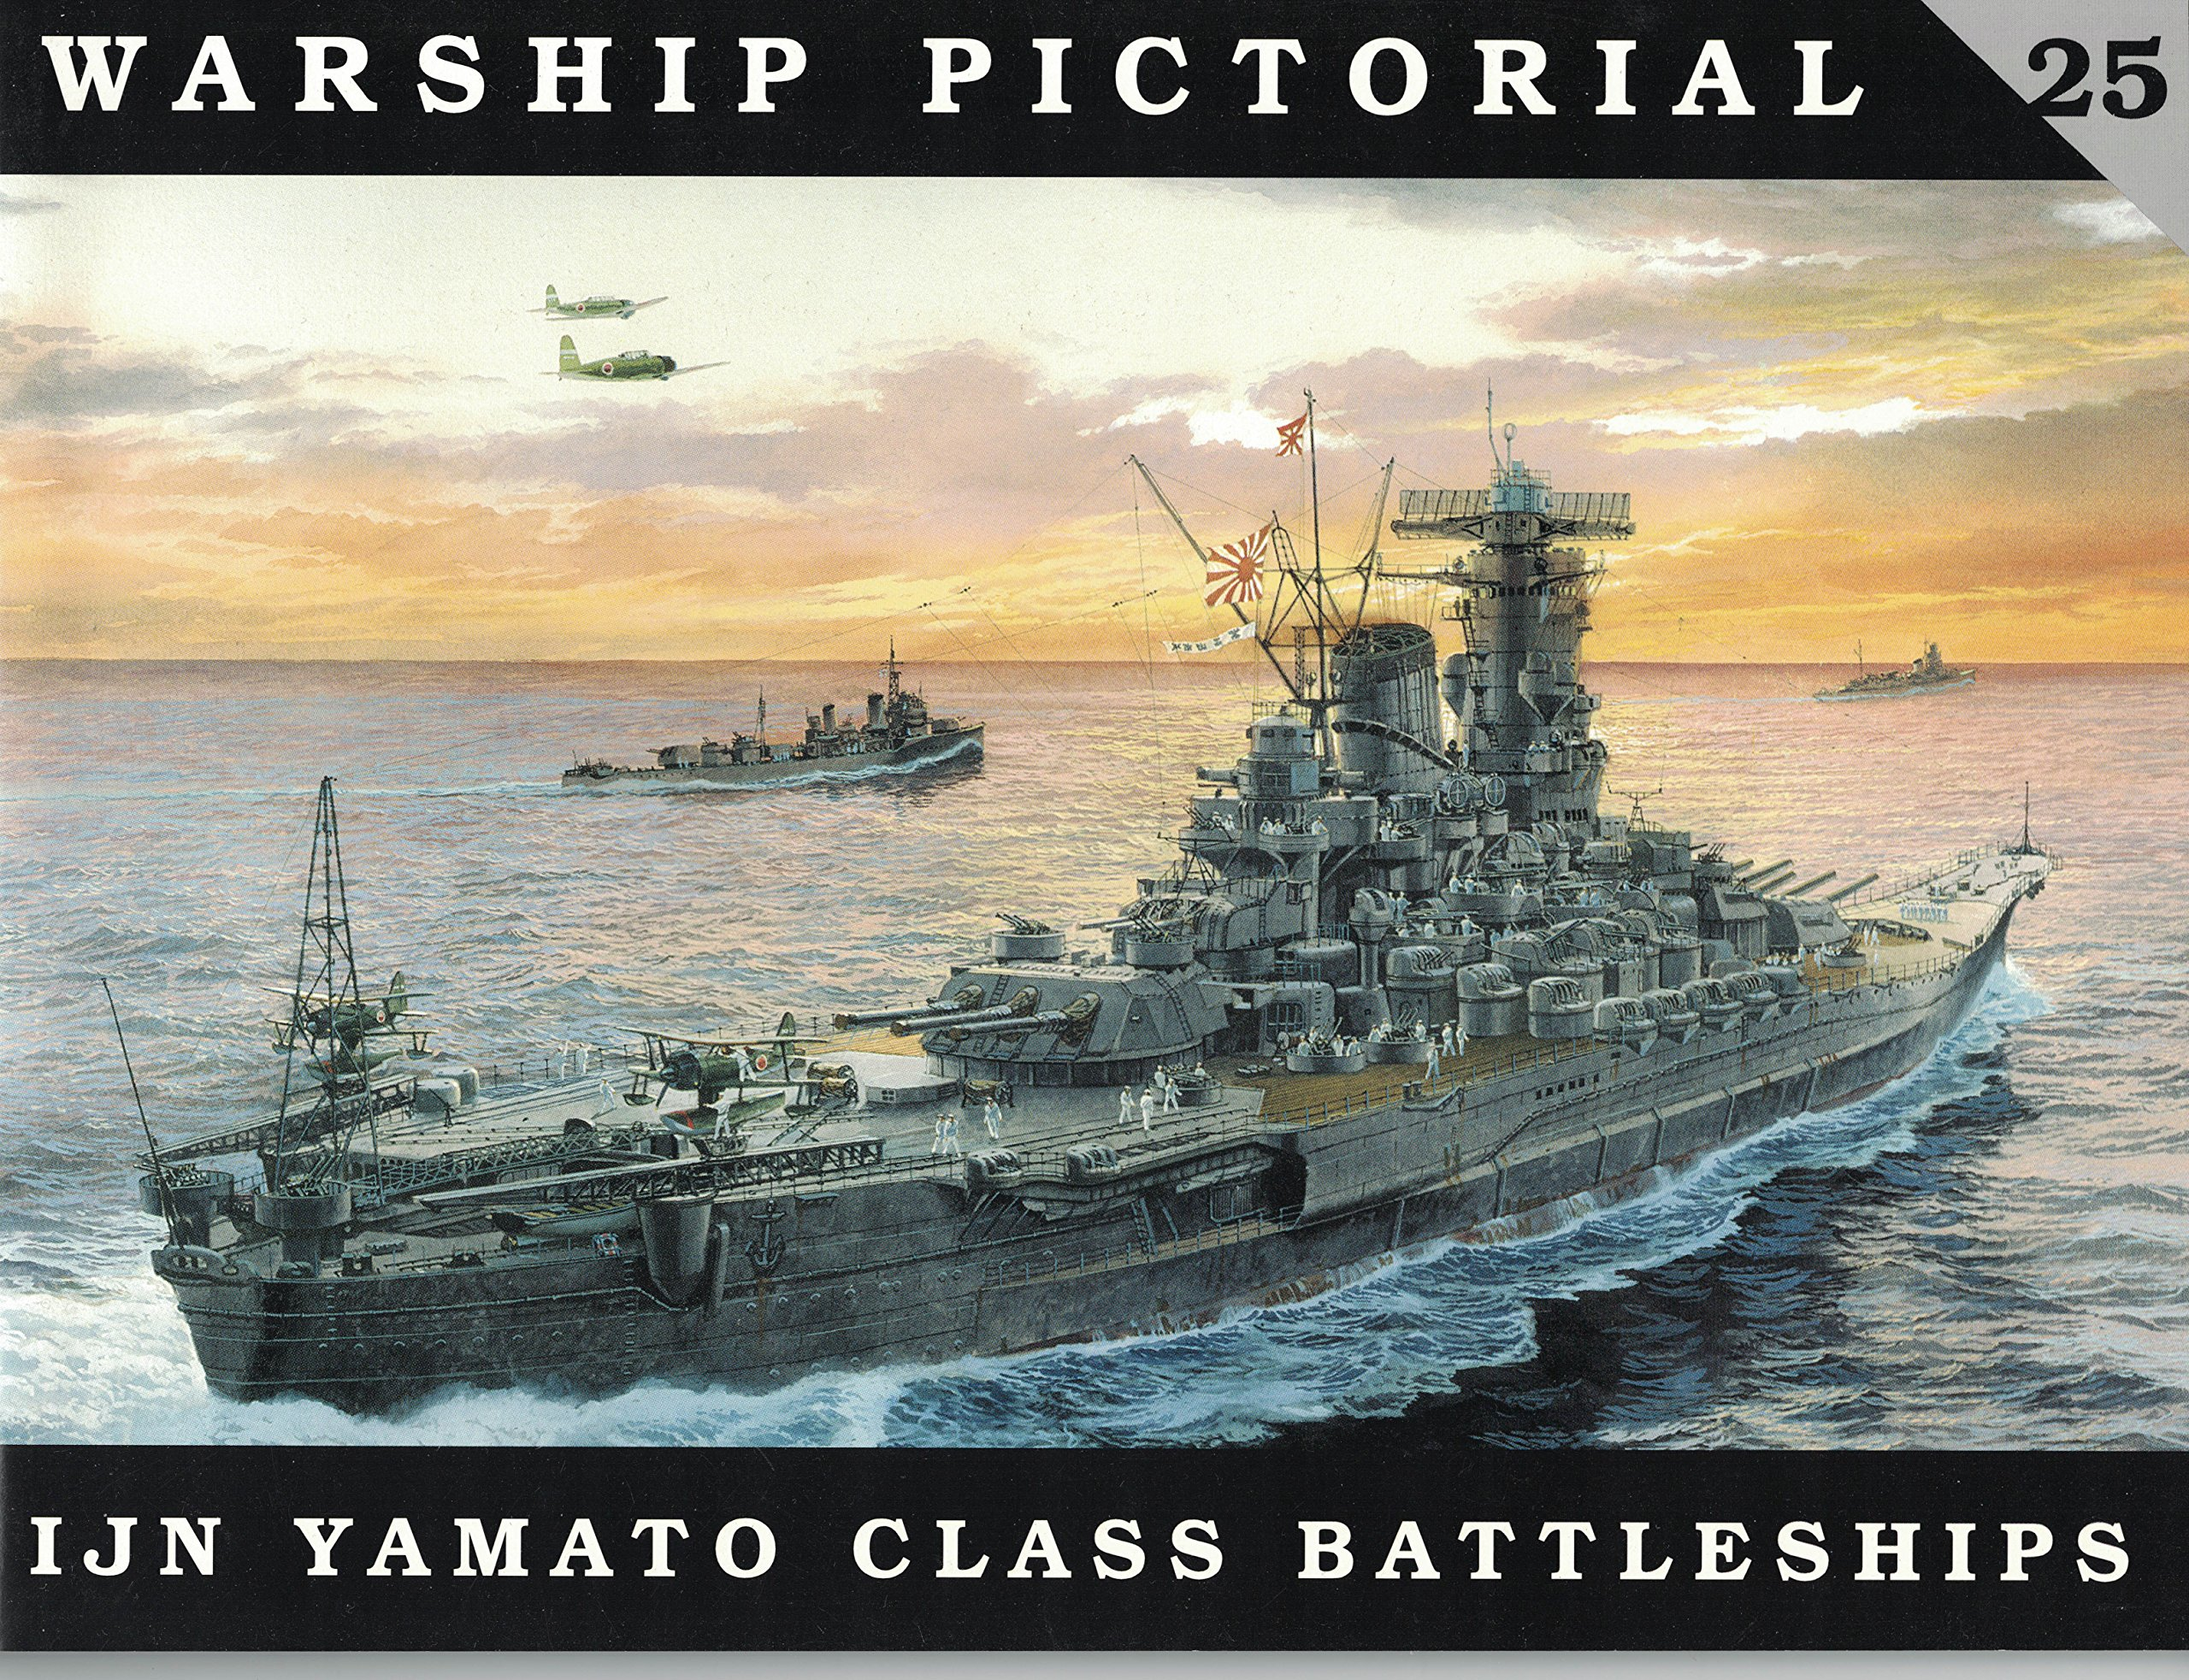 Warship Pictorial No  25 - IJN Yamato Class Battleships